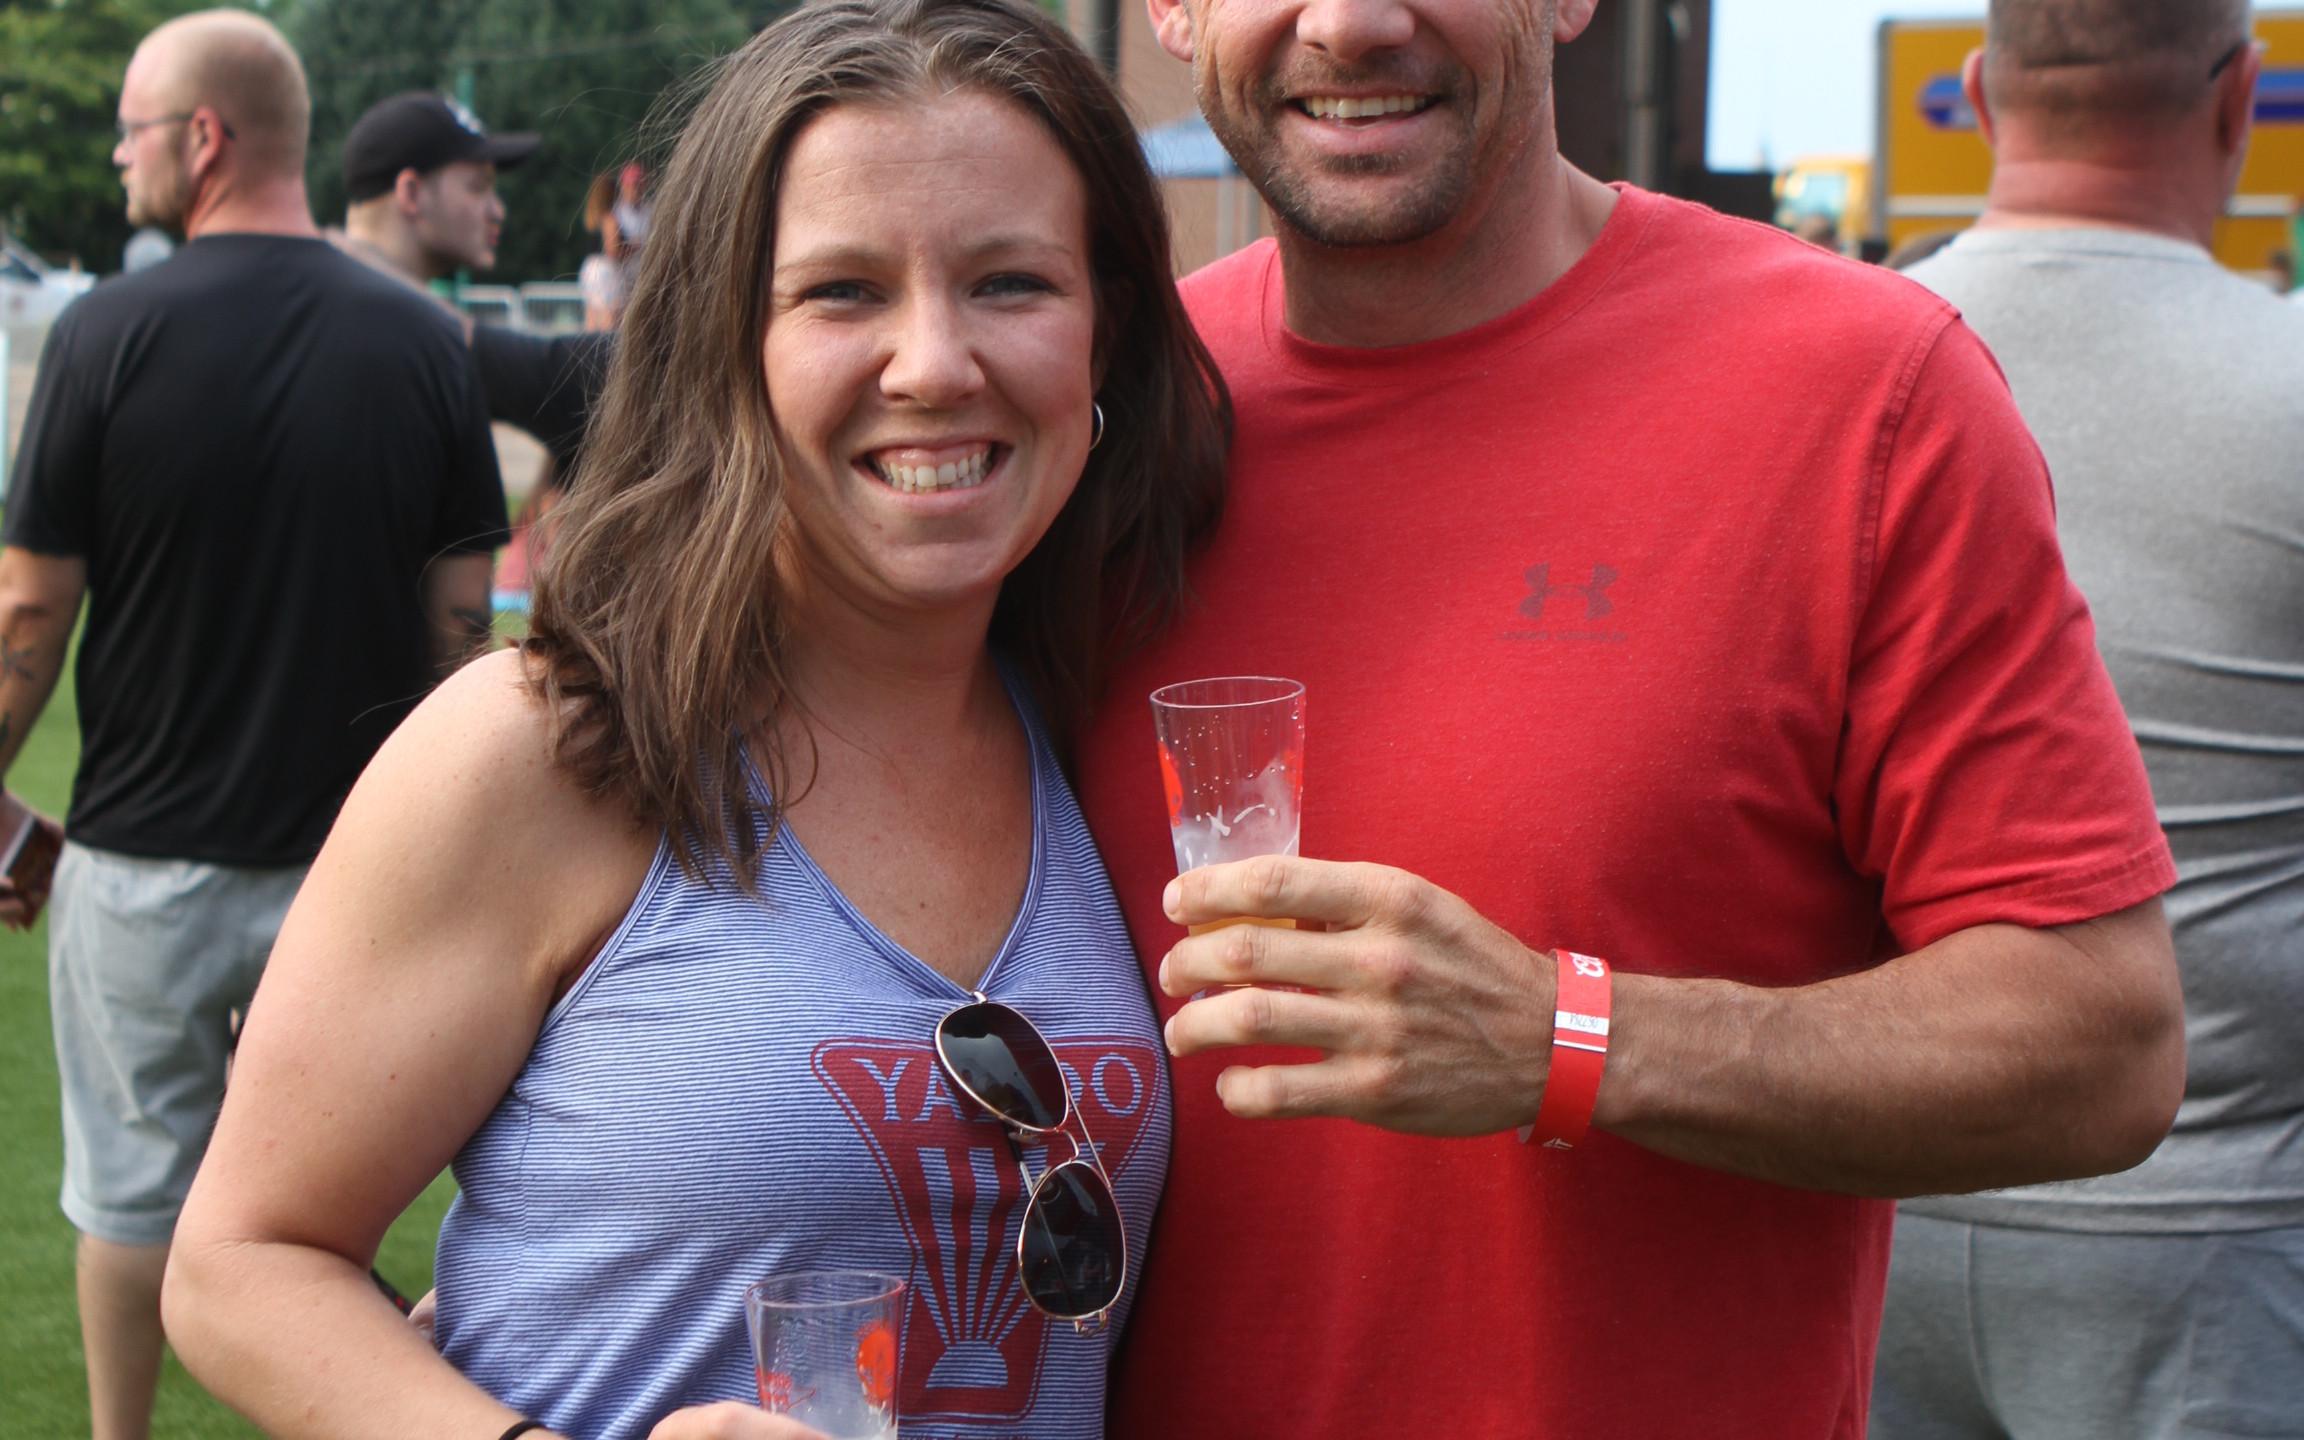 Amanda Crumb and David Moscarello